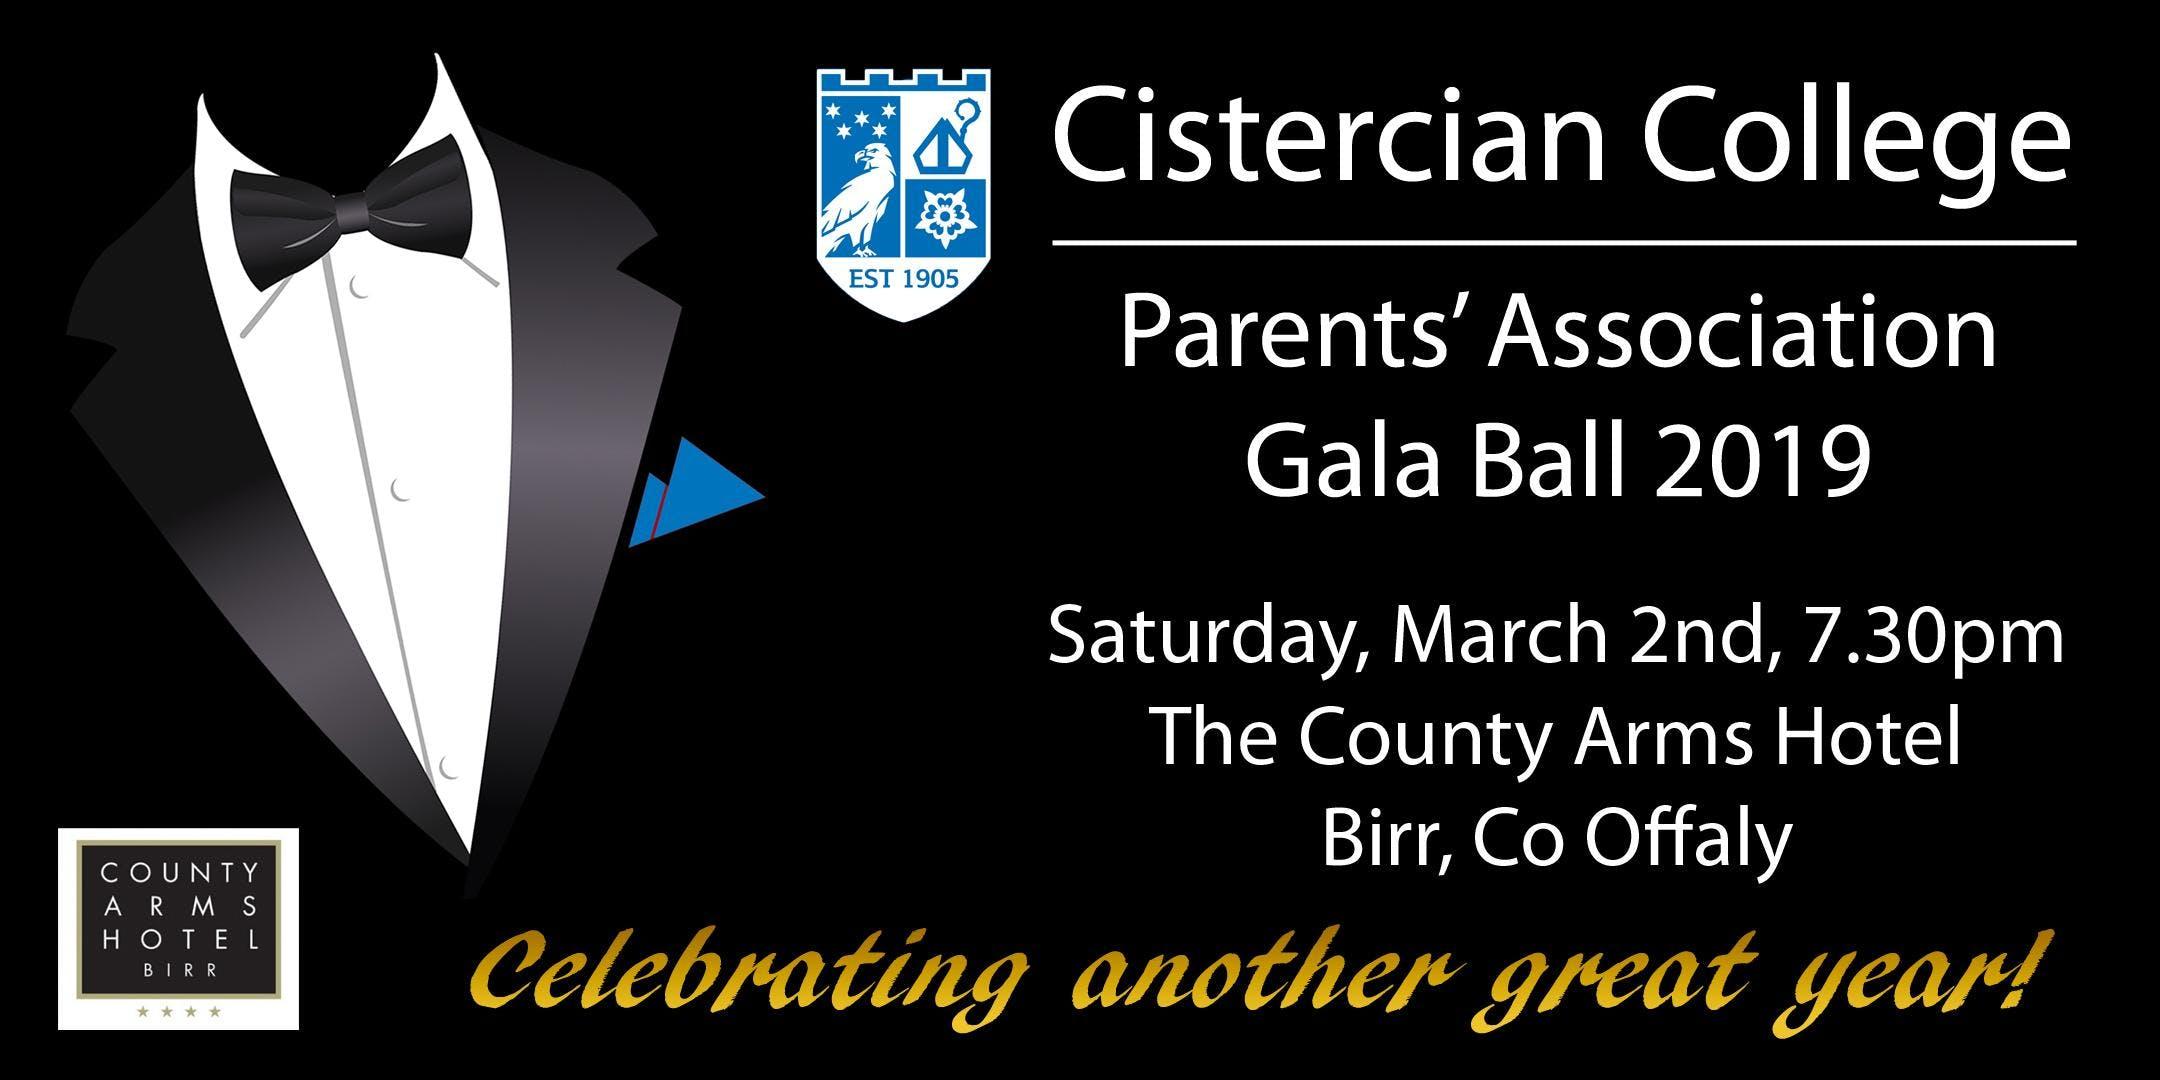 2019 Cistercian College Gala Ball